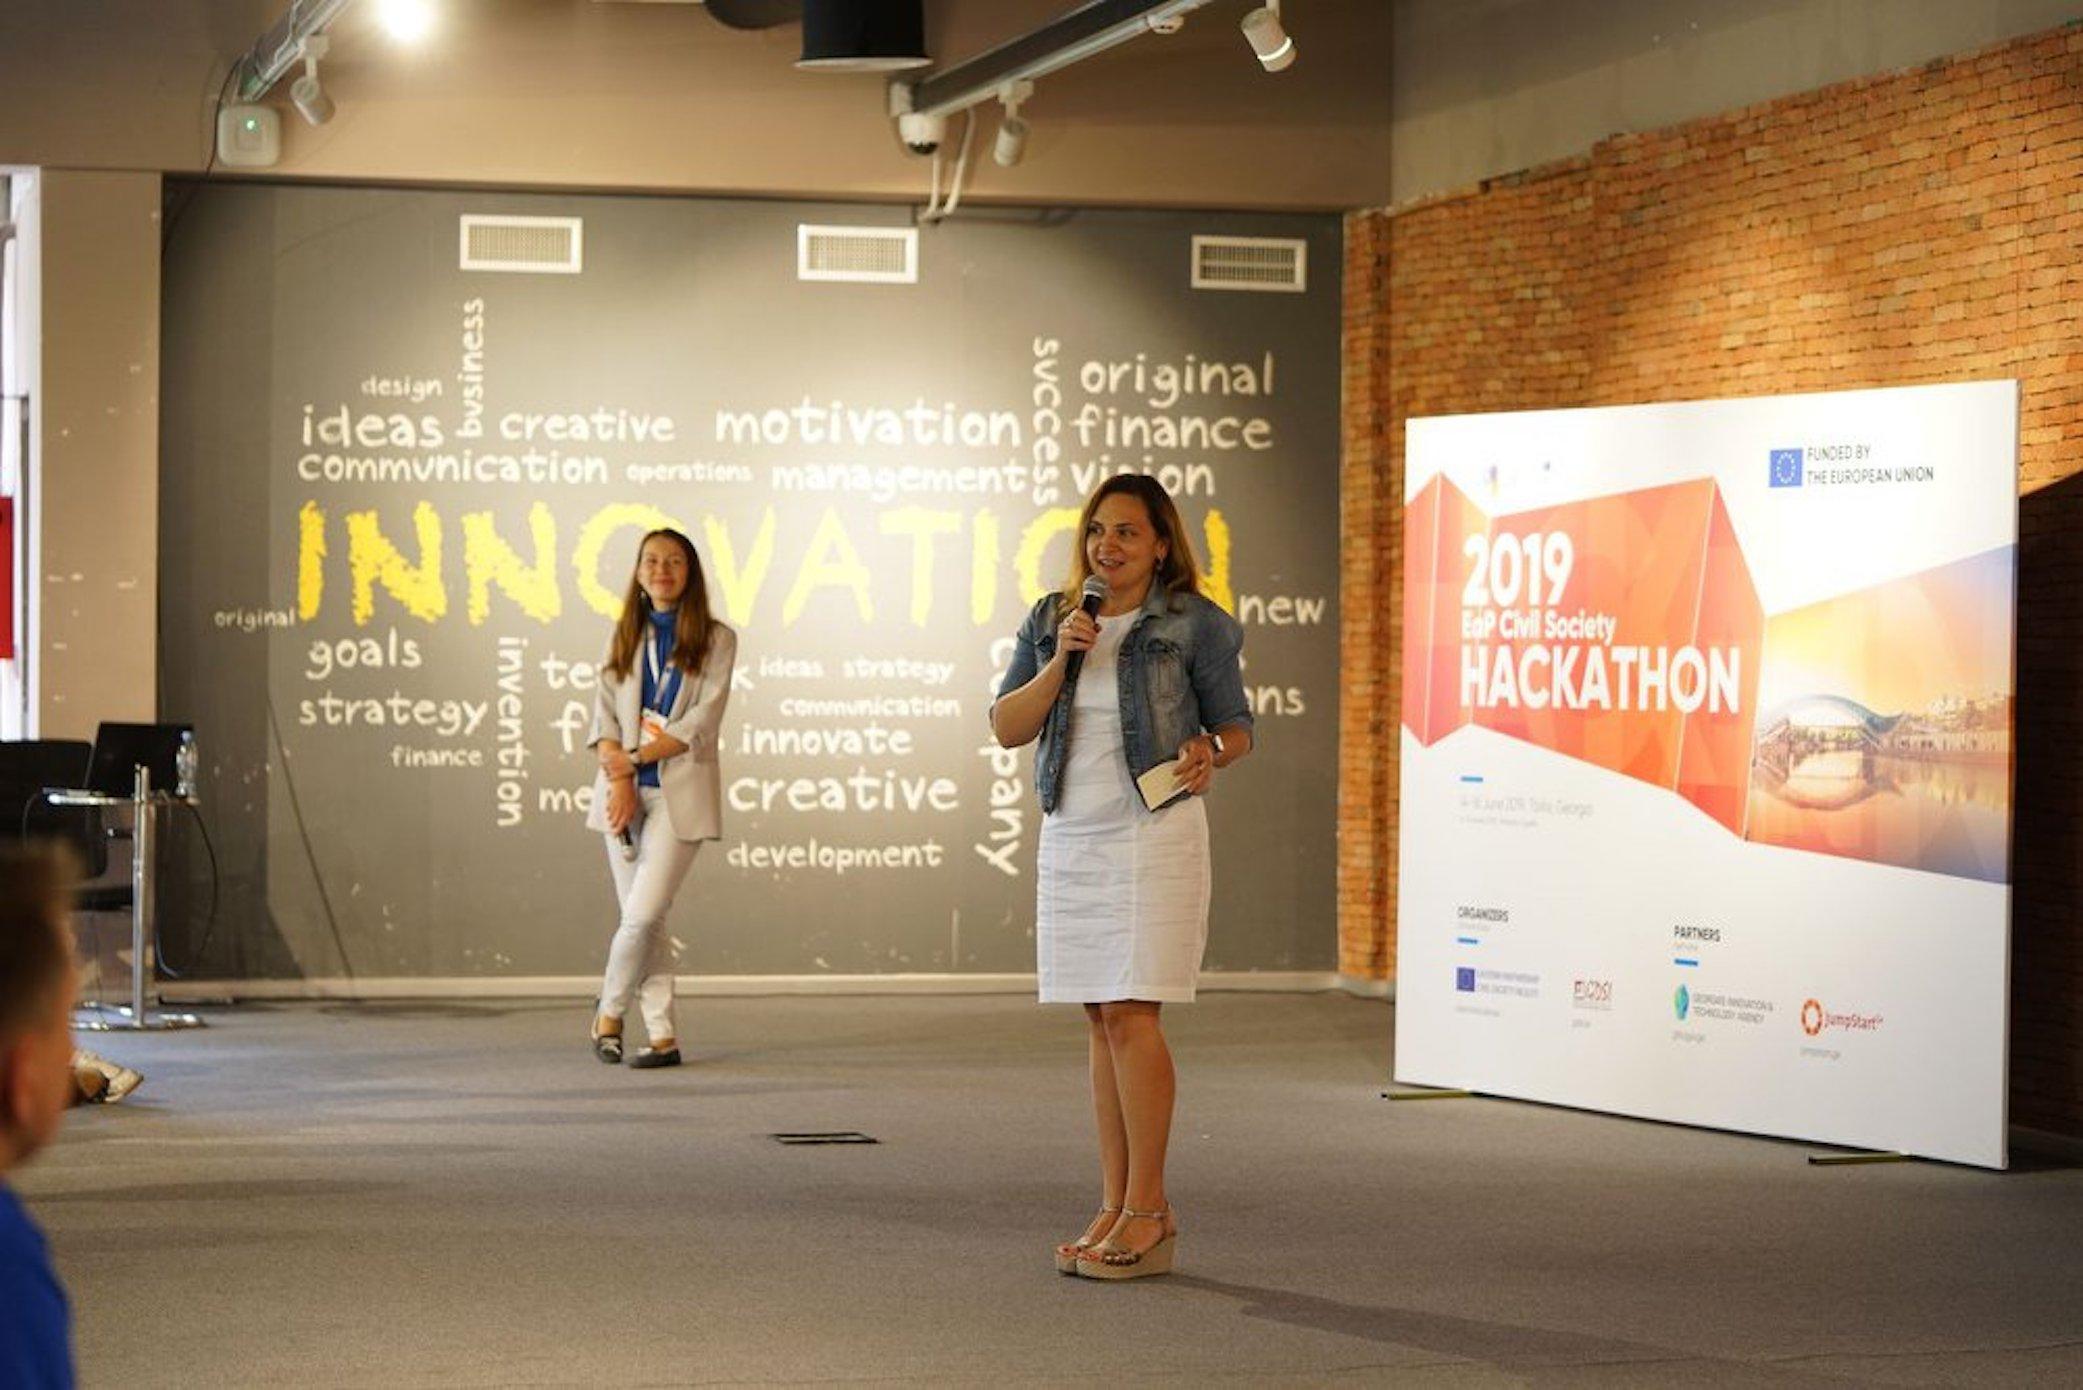 2019 EaP Civil Society Hackathon in Tbilisi